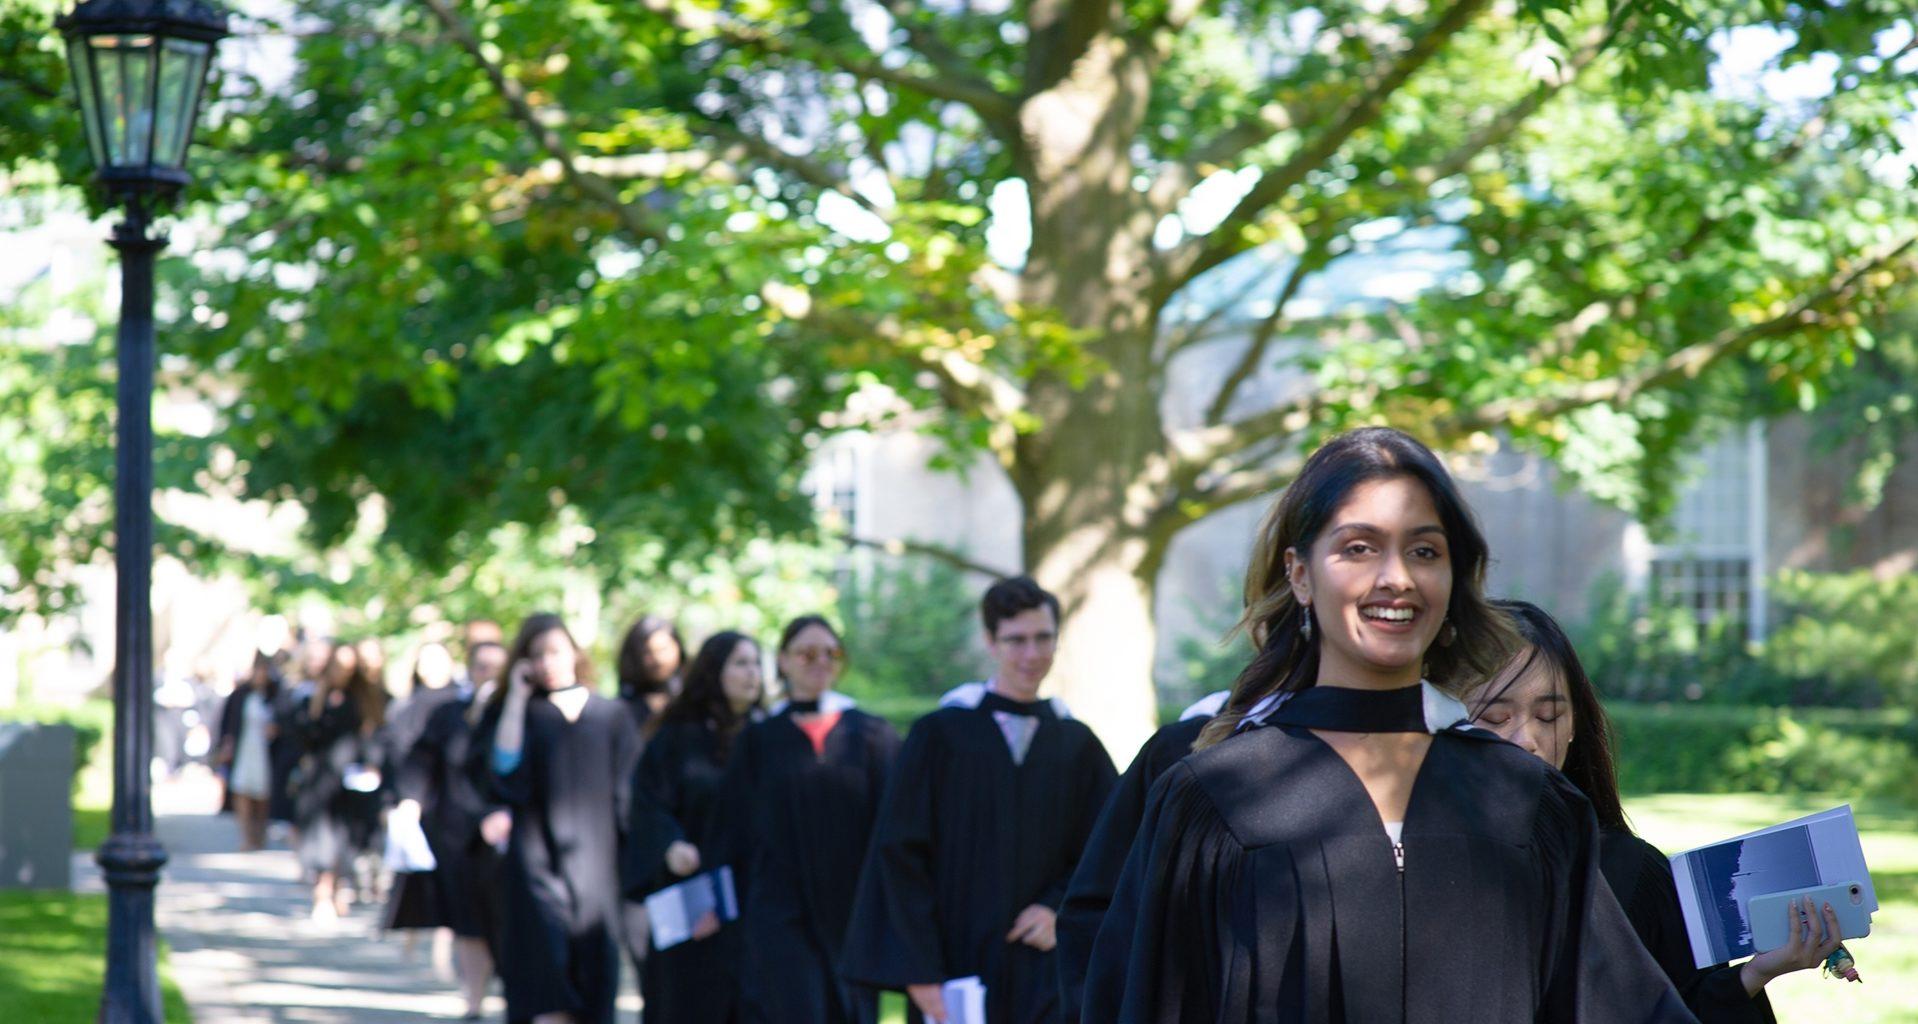 Graduands process to Convocation Hall for their Graduation Ceremony